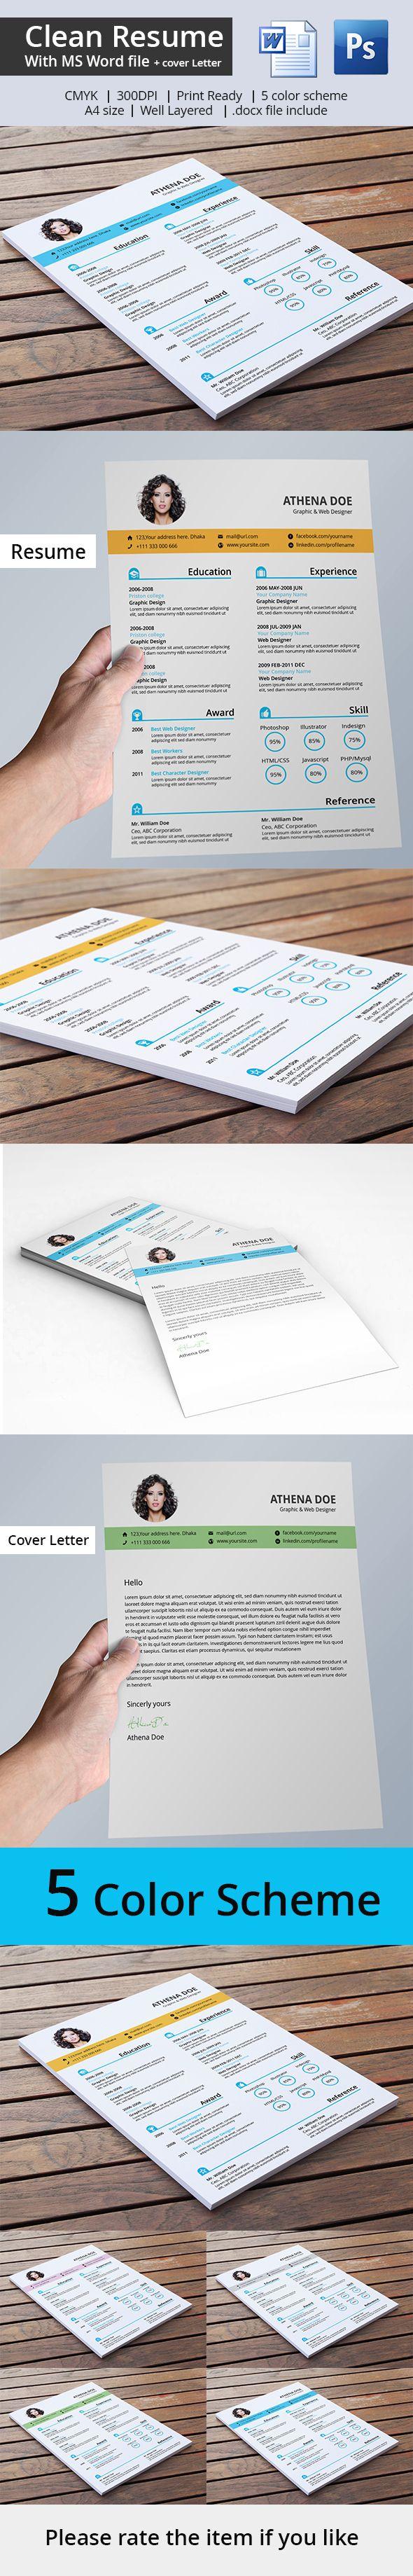 251 Best Resume Images On Pinterest Resume Ideas Resume Tips